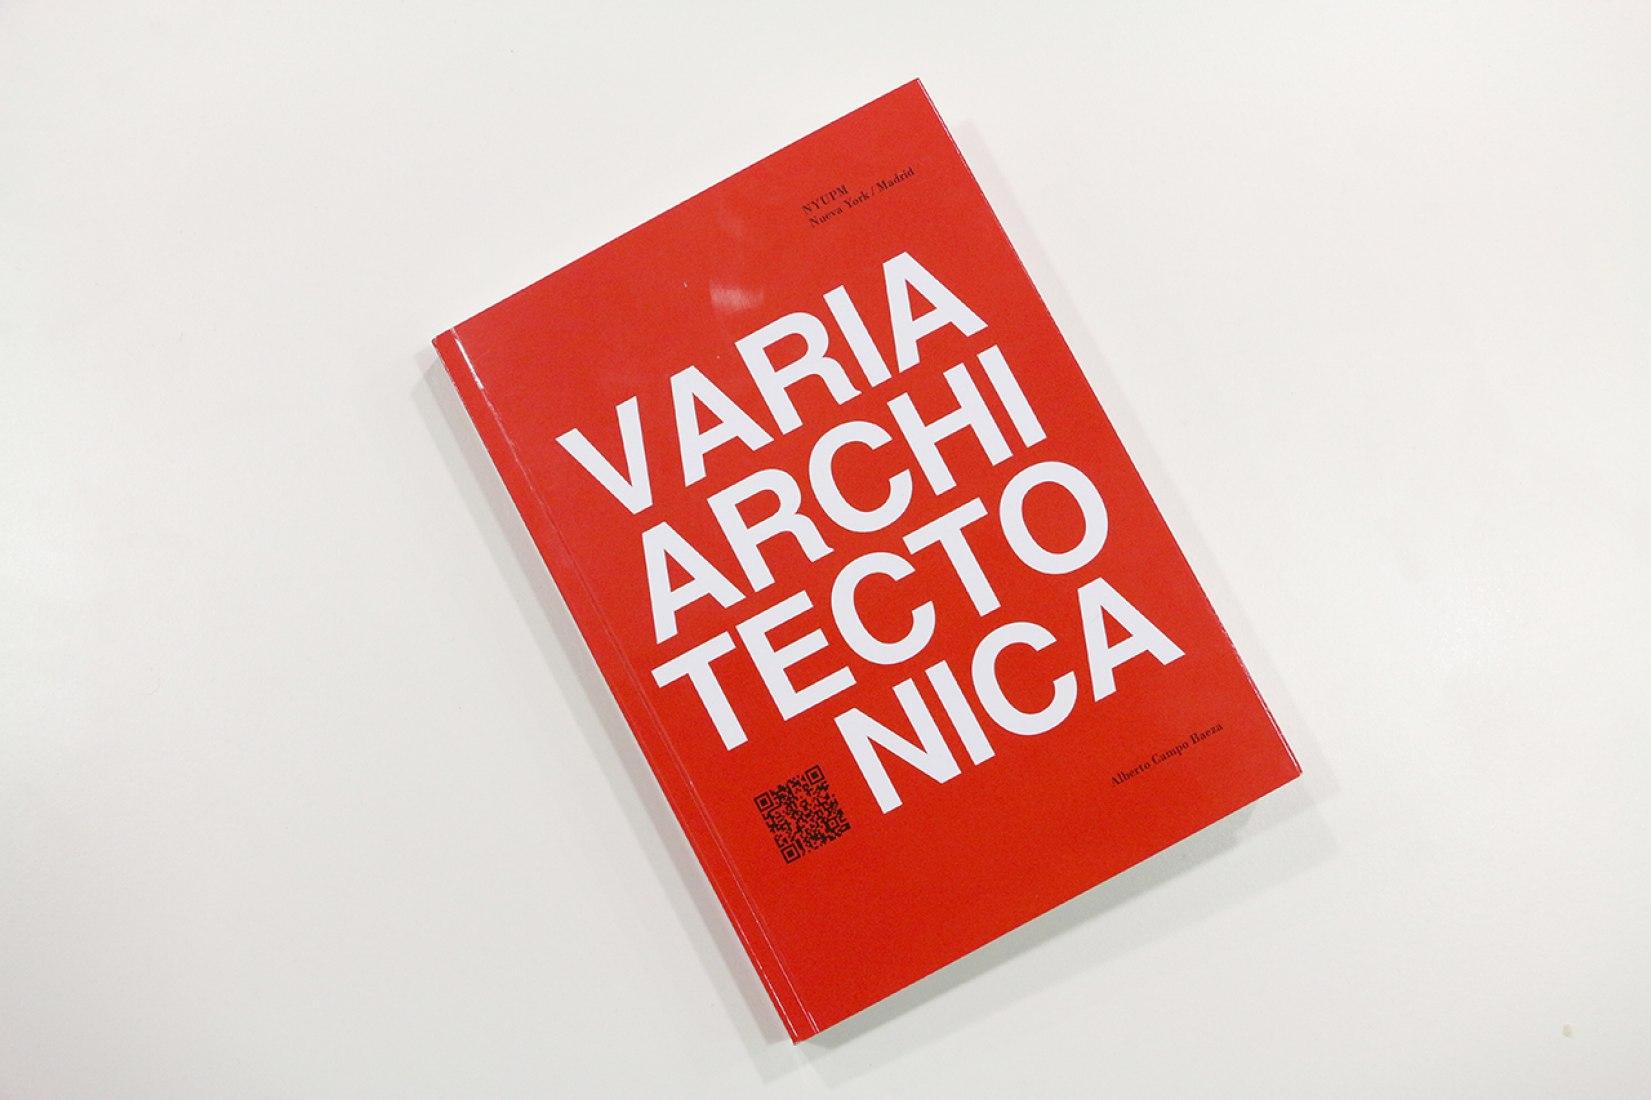 Cover of the book Varia Architectonica by Alberto Campo Baeza.